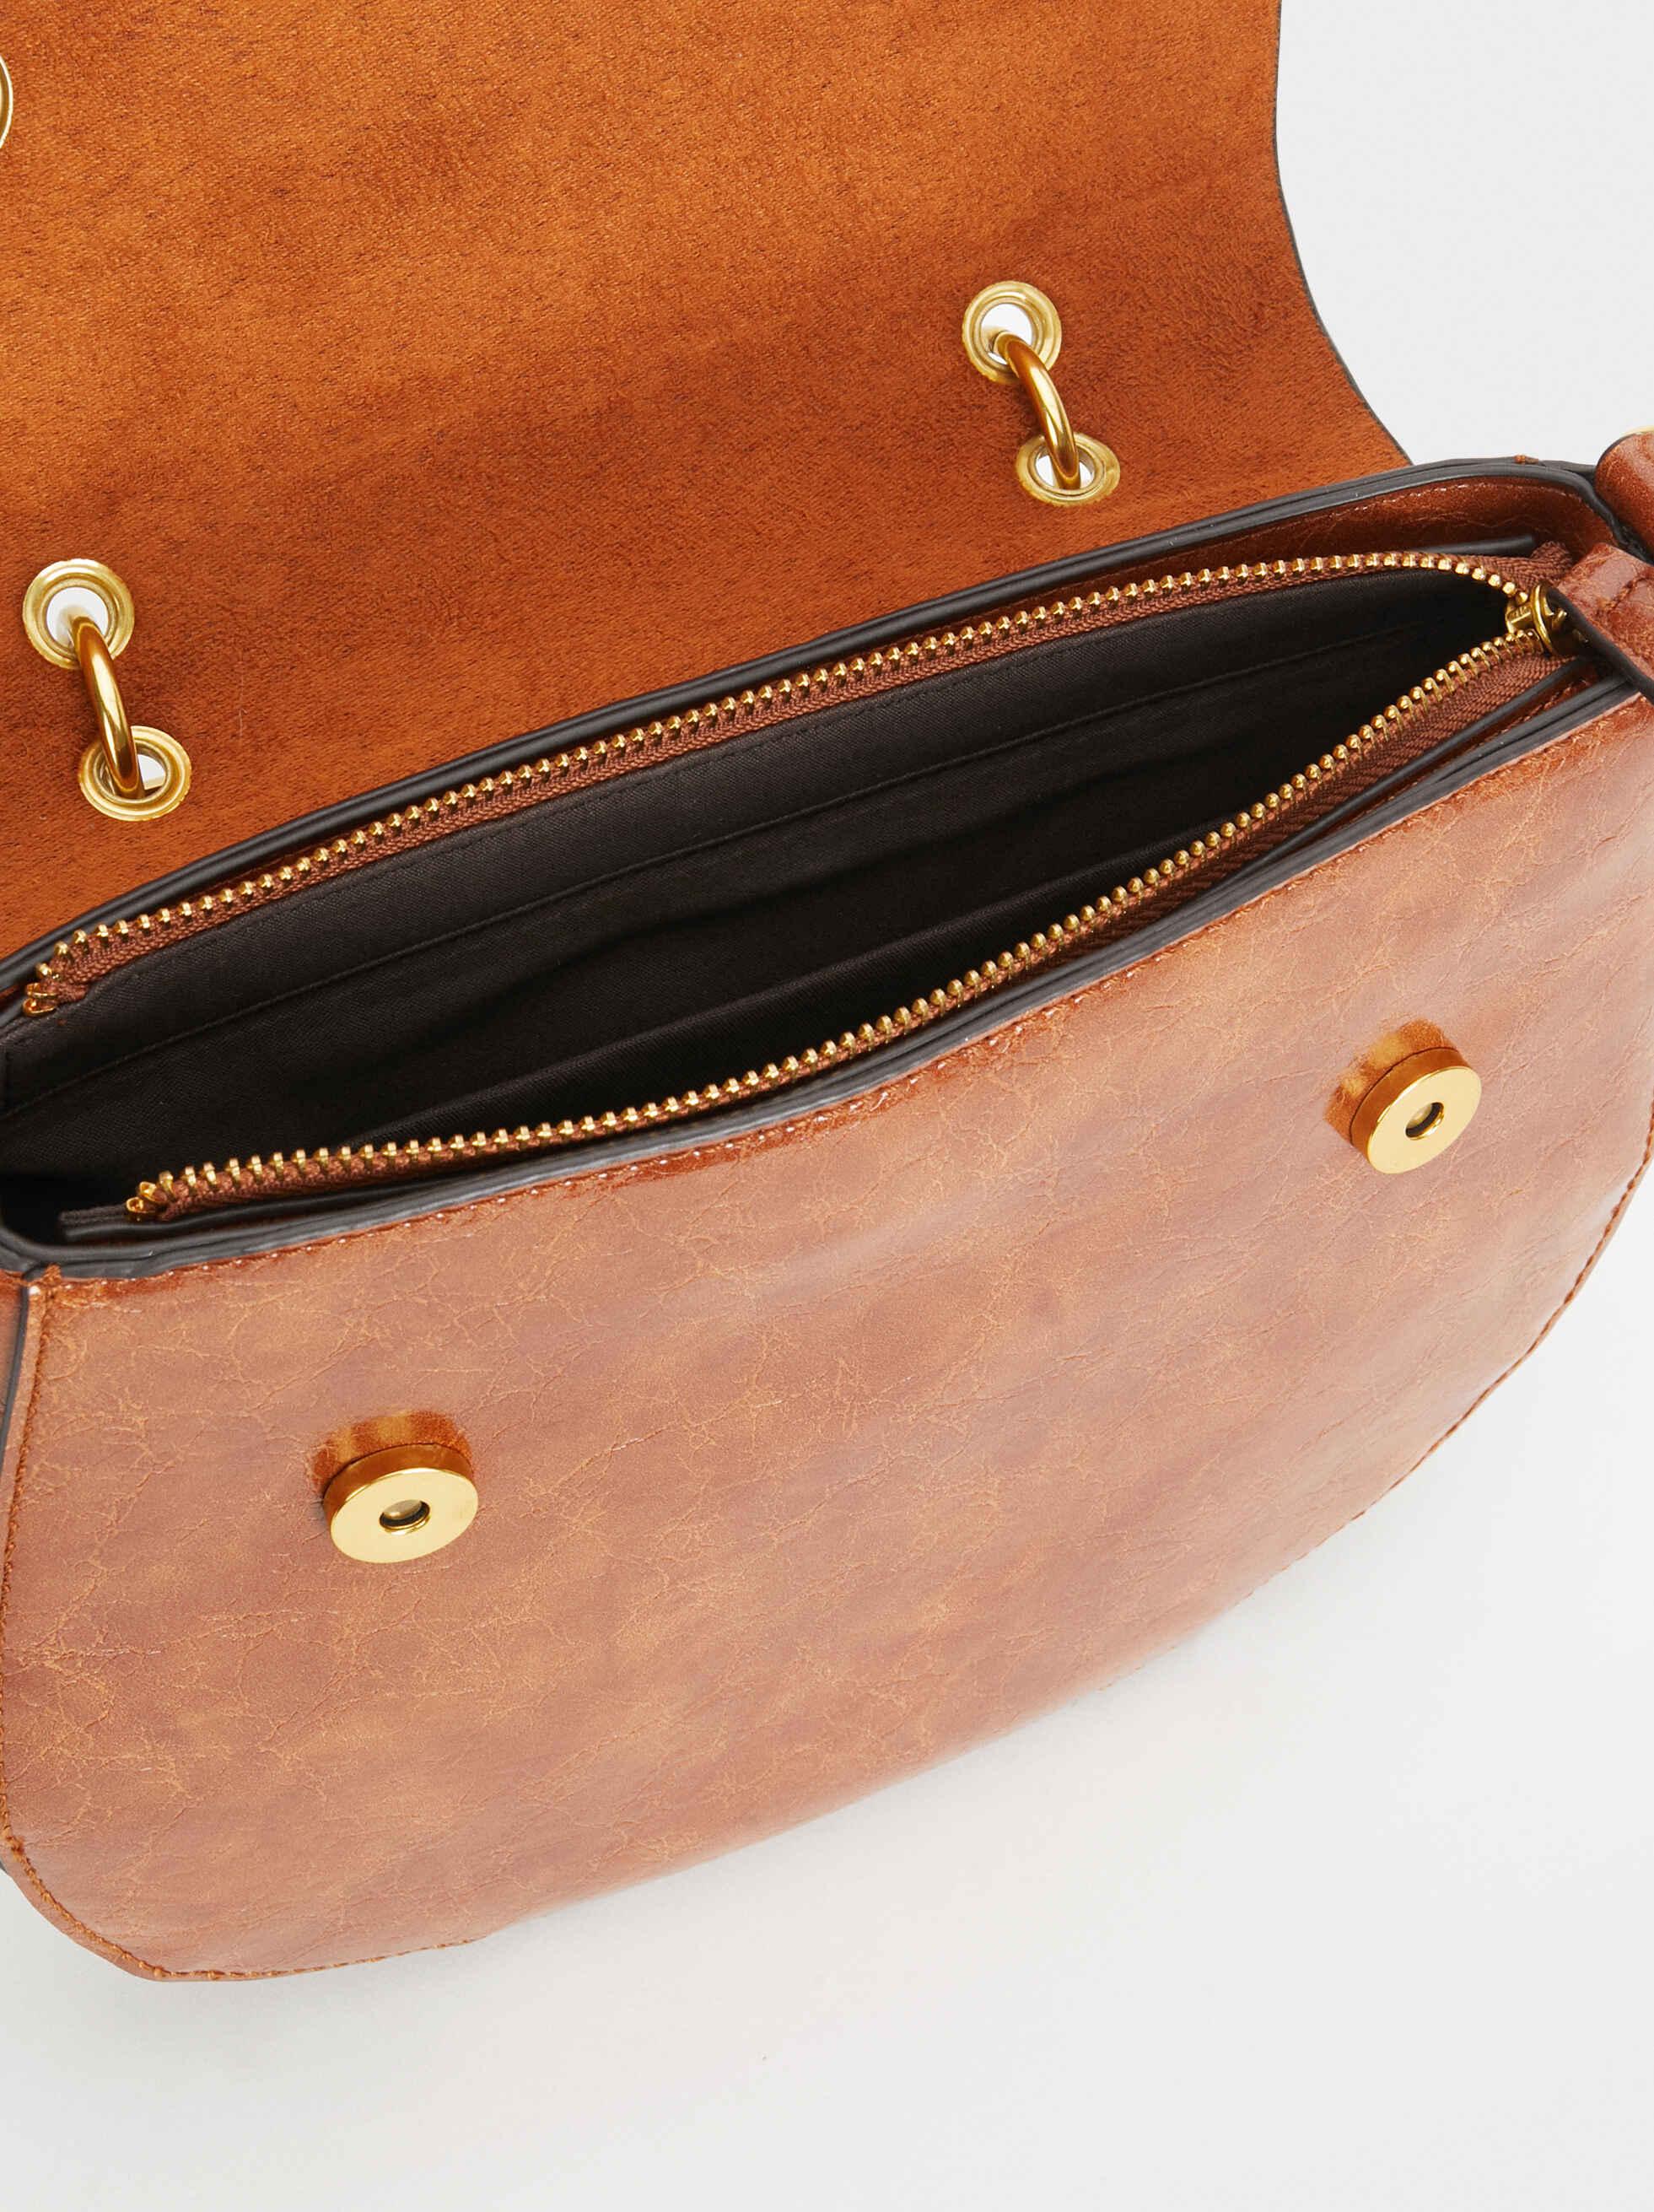 Crossbody Bag With Metallic Handle, Camel, hi-res